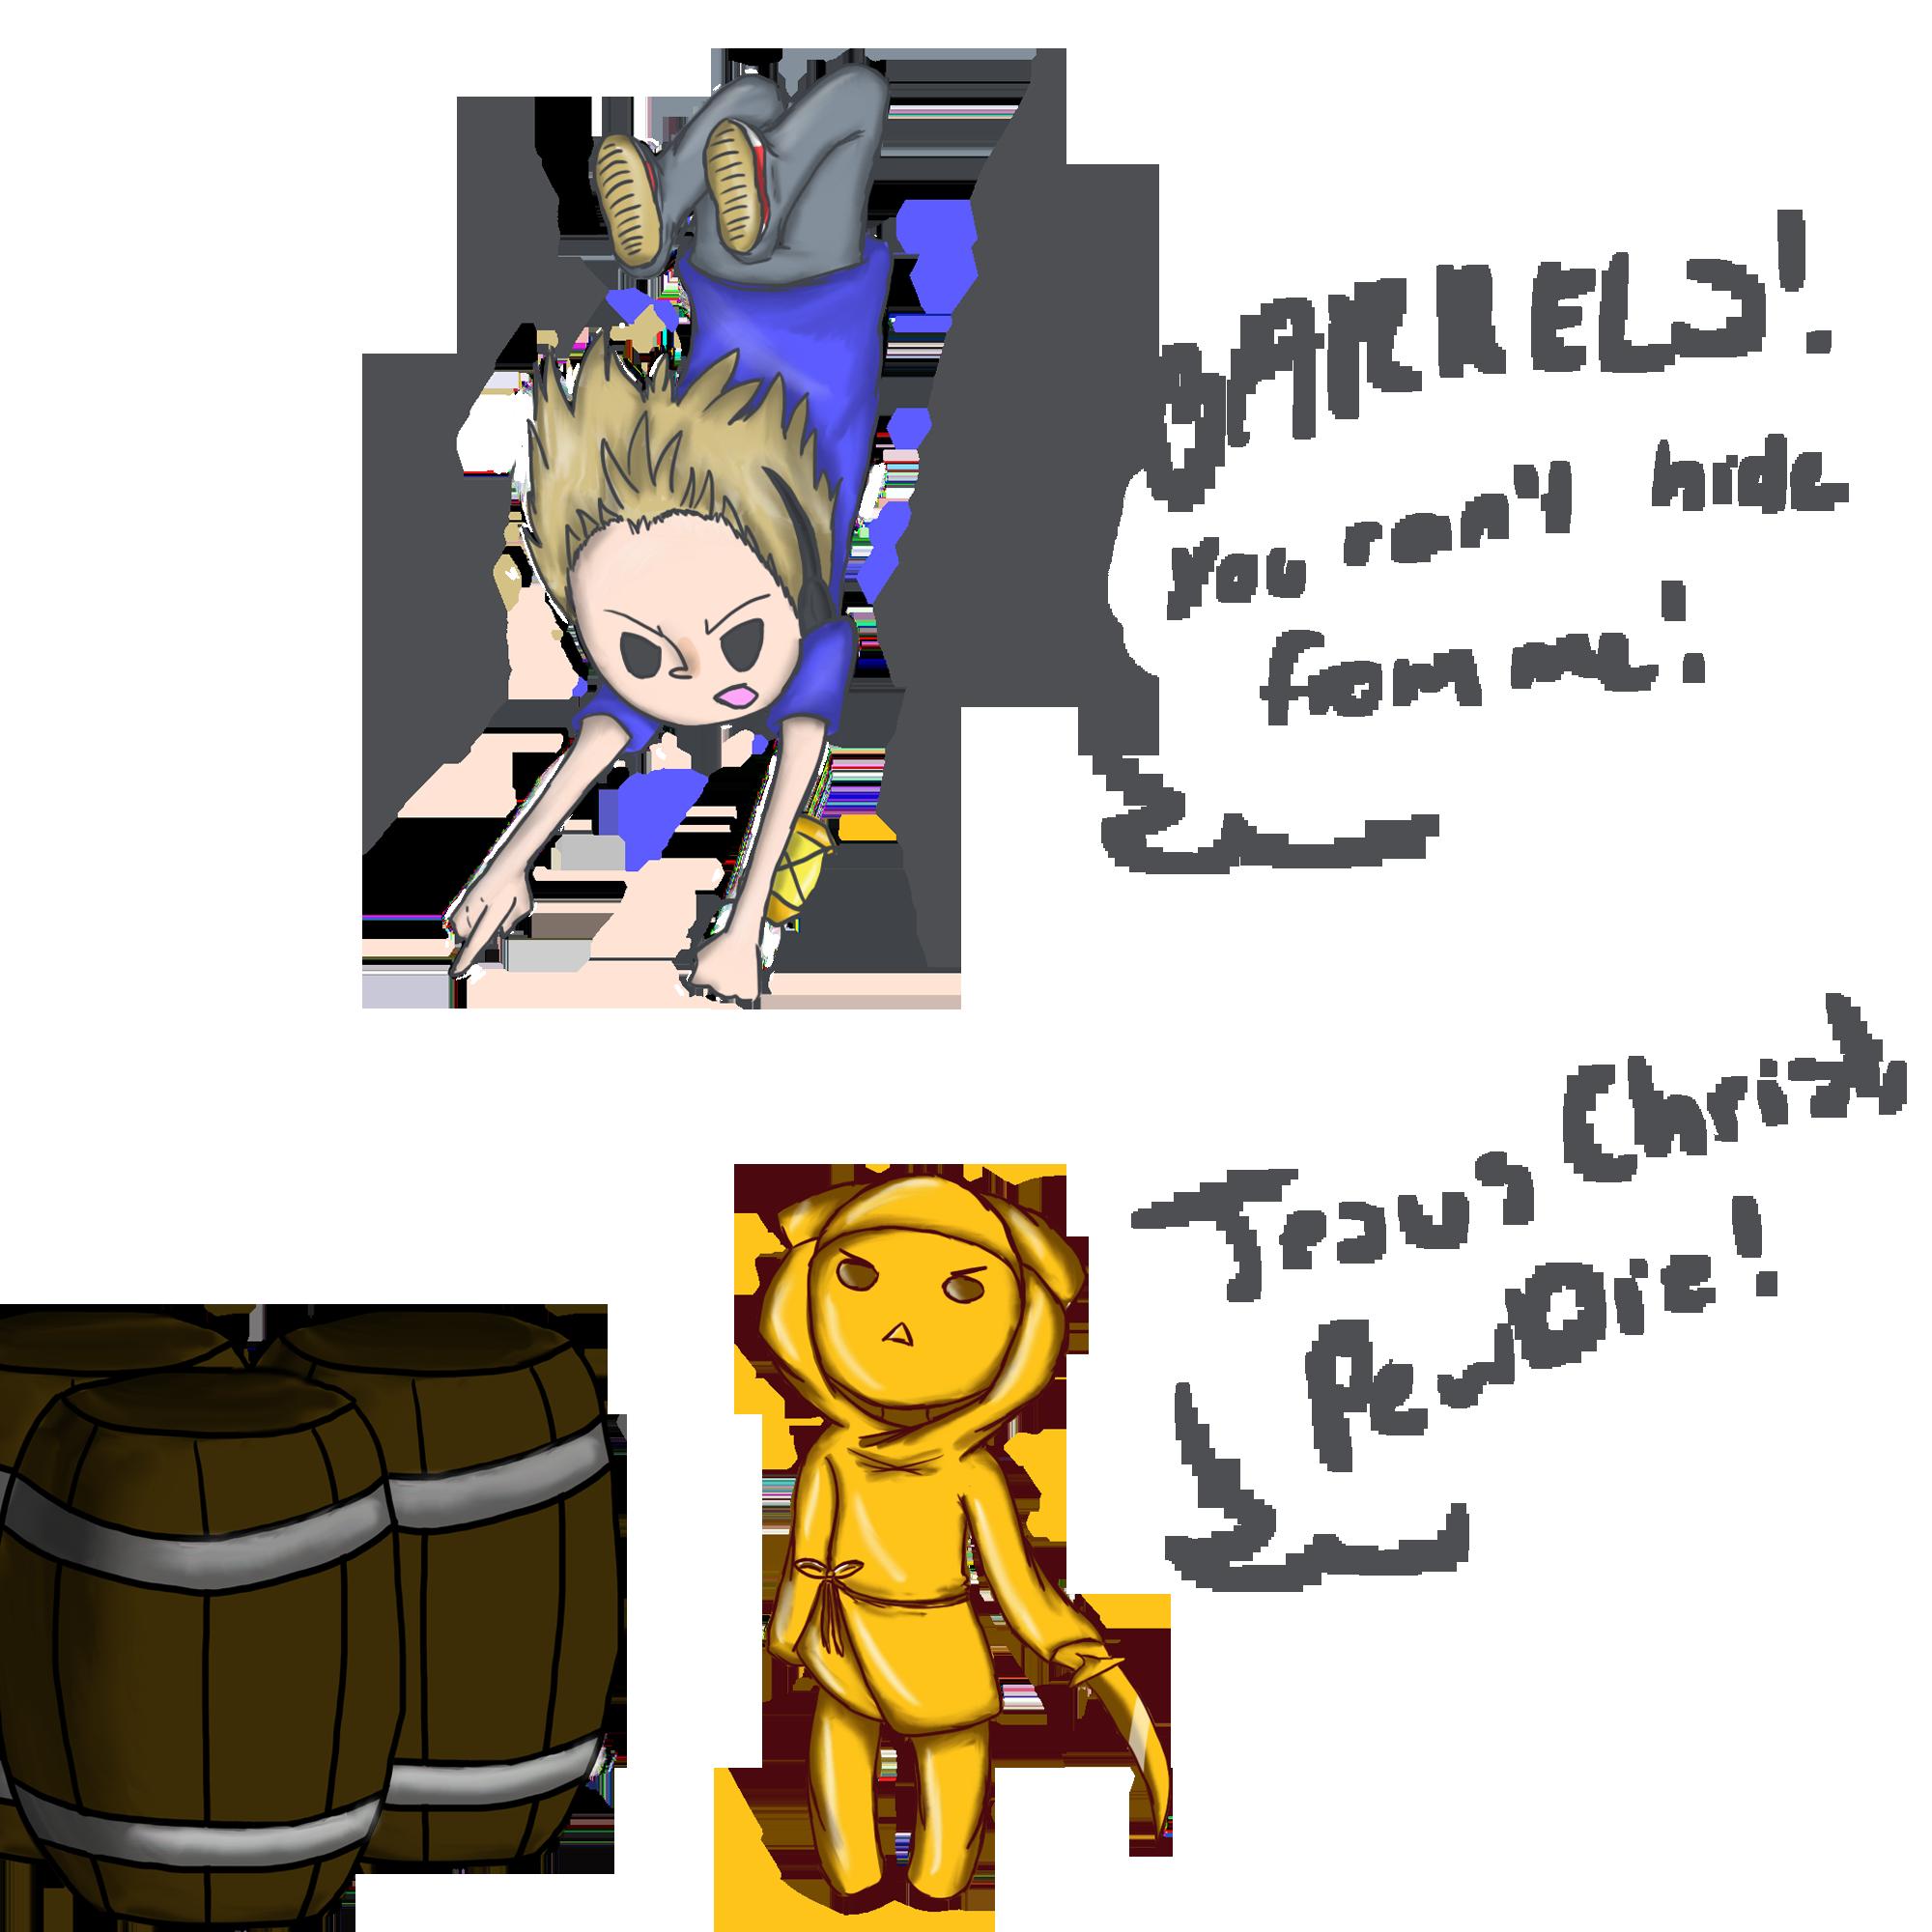 BARRELS! -PewDiePie fanart- by HeeeeresIzzy